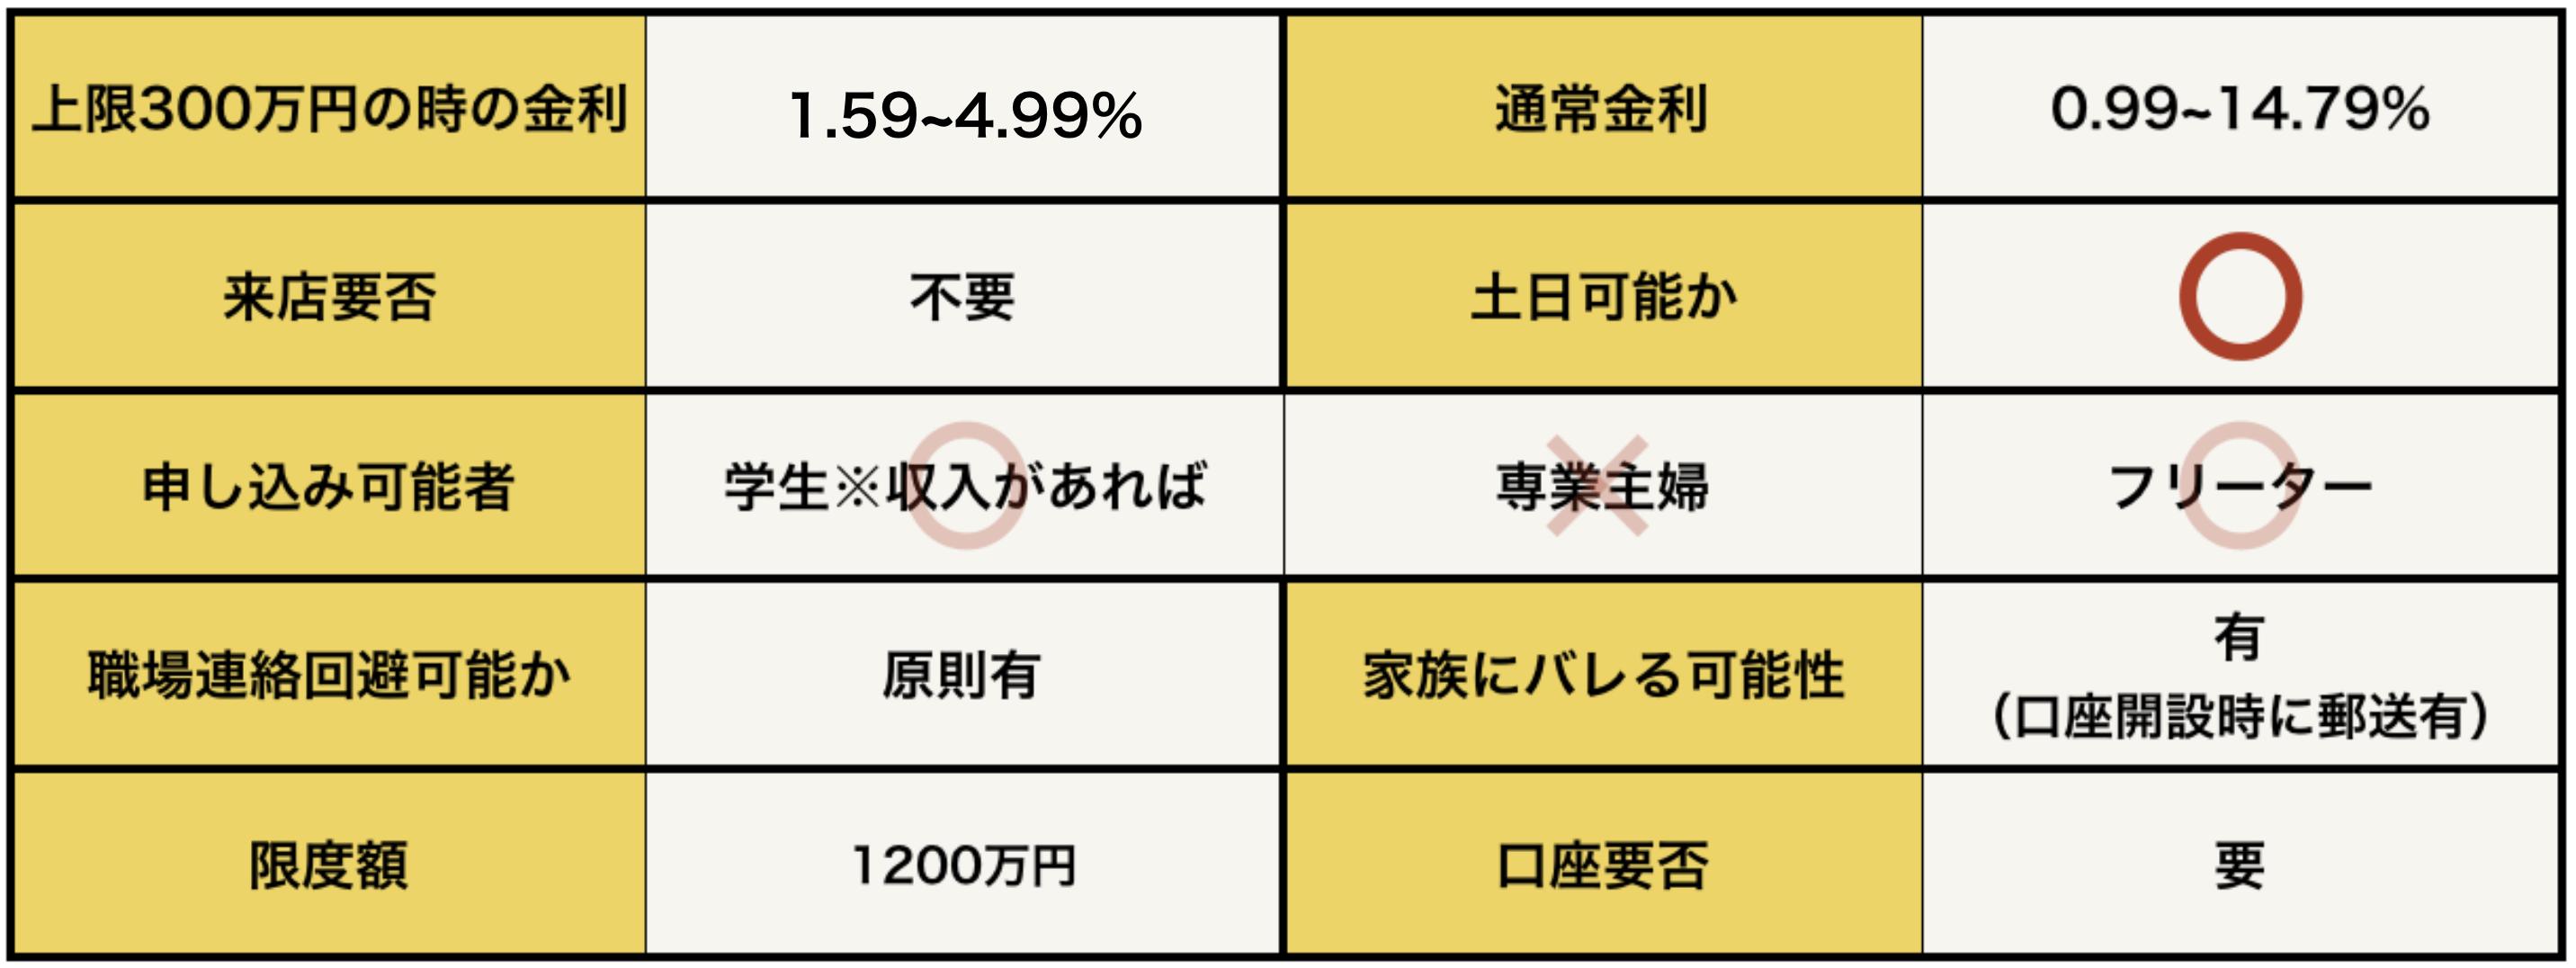 MRカードローンデータ(300万)